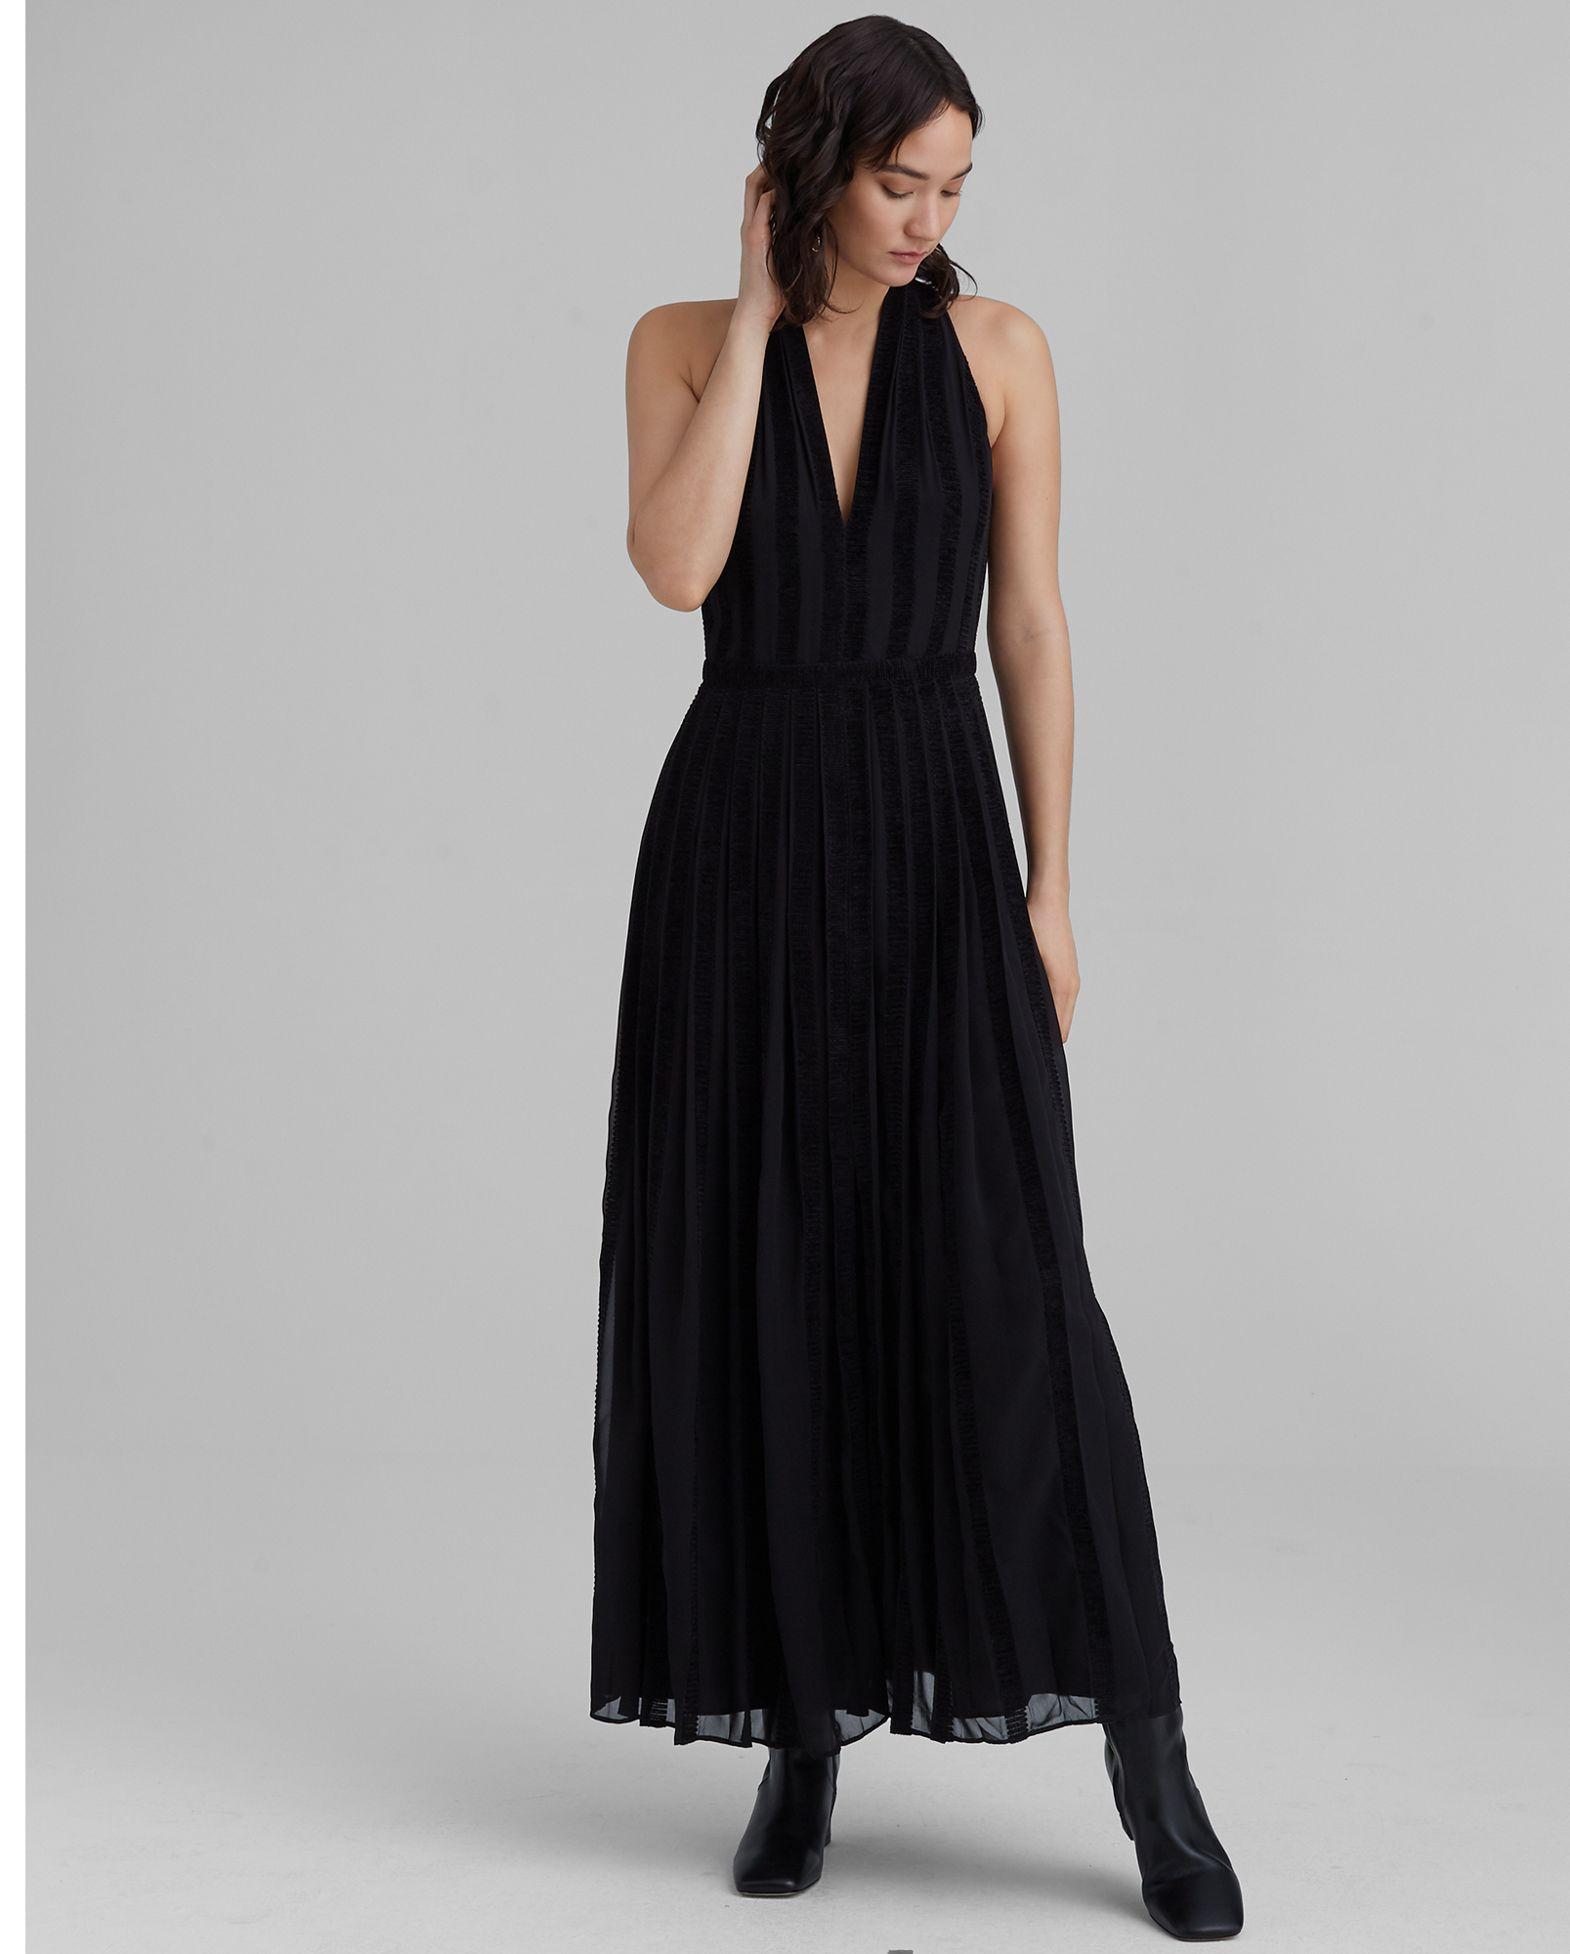 CLUB MONACO Textured Zigzag Dress